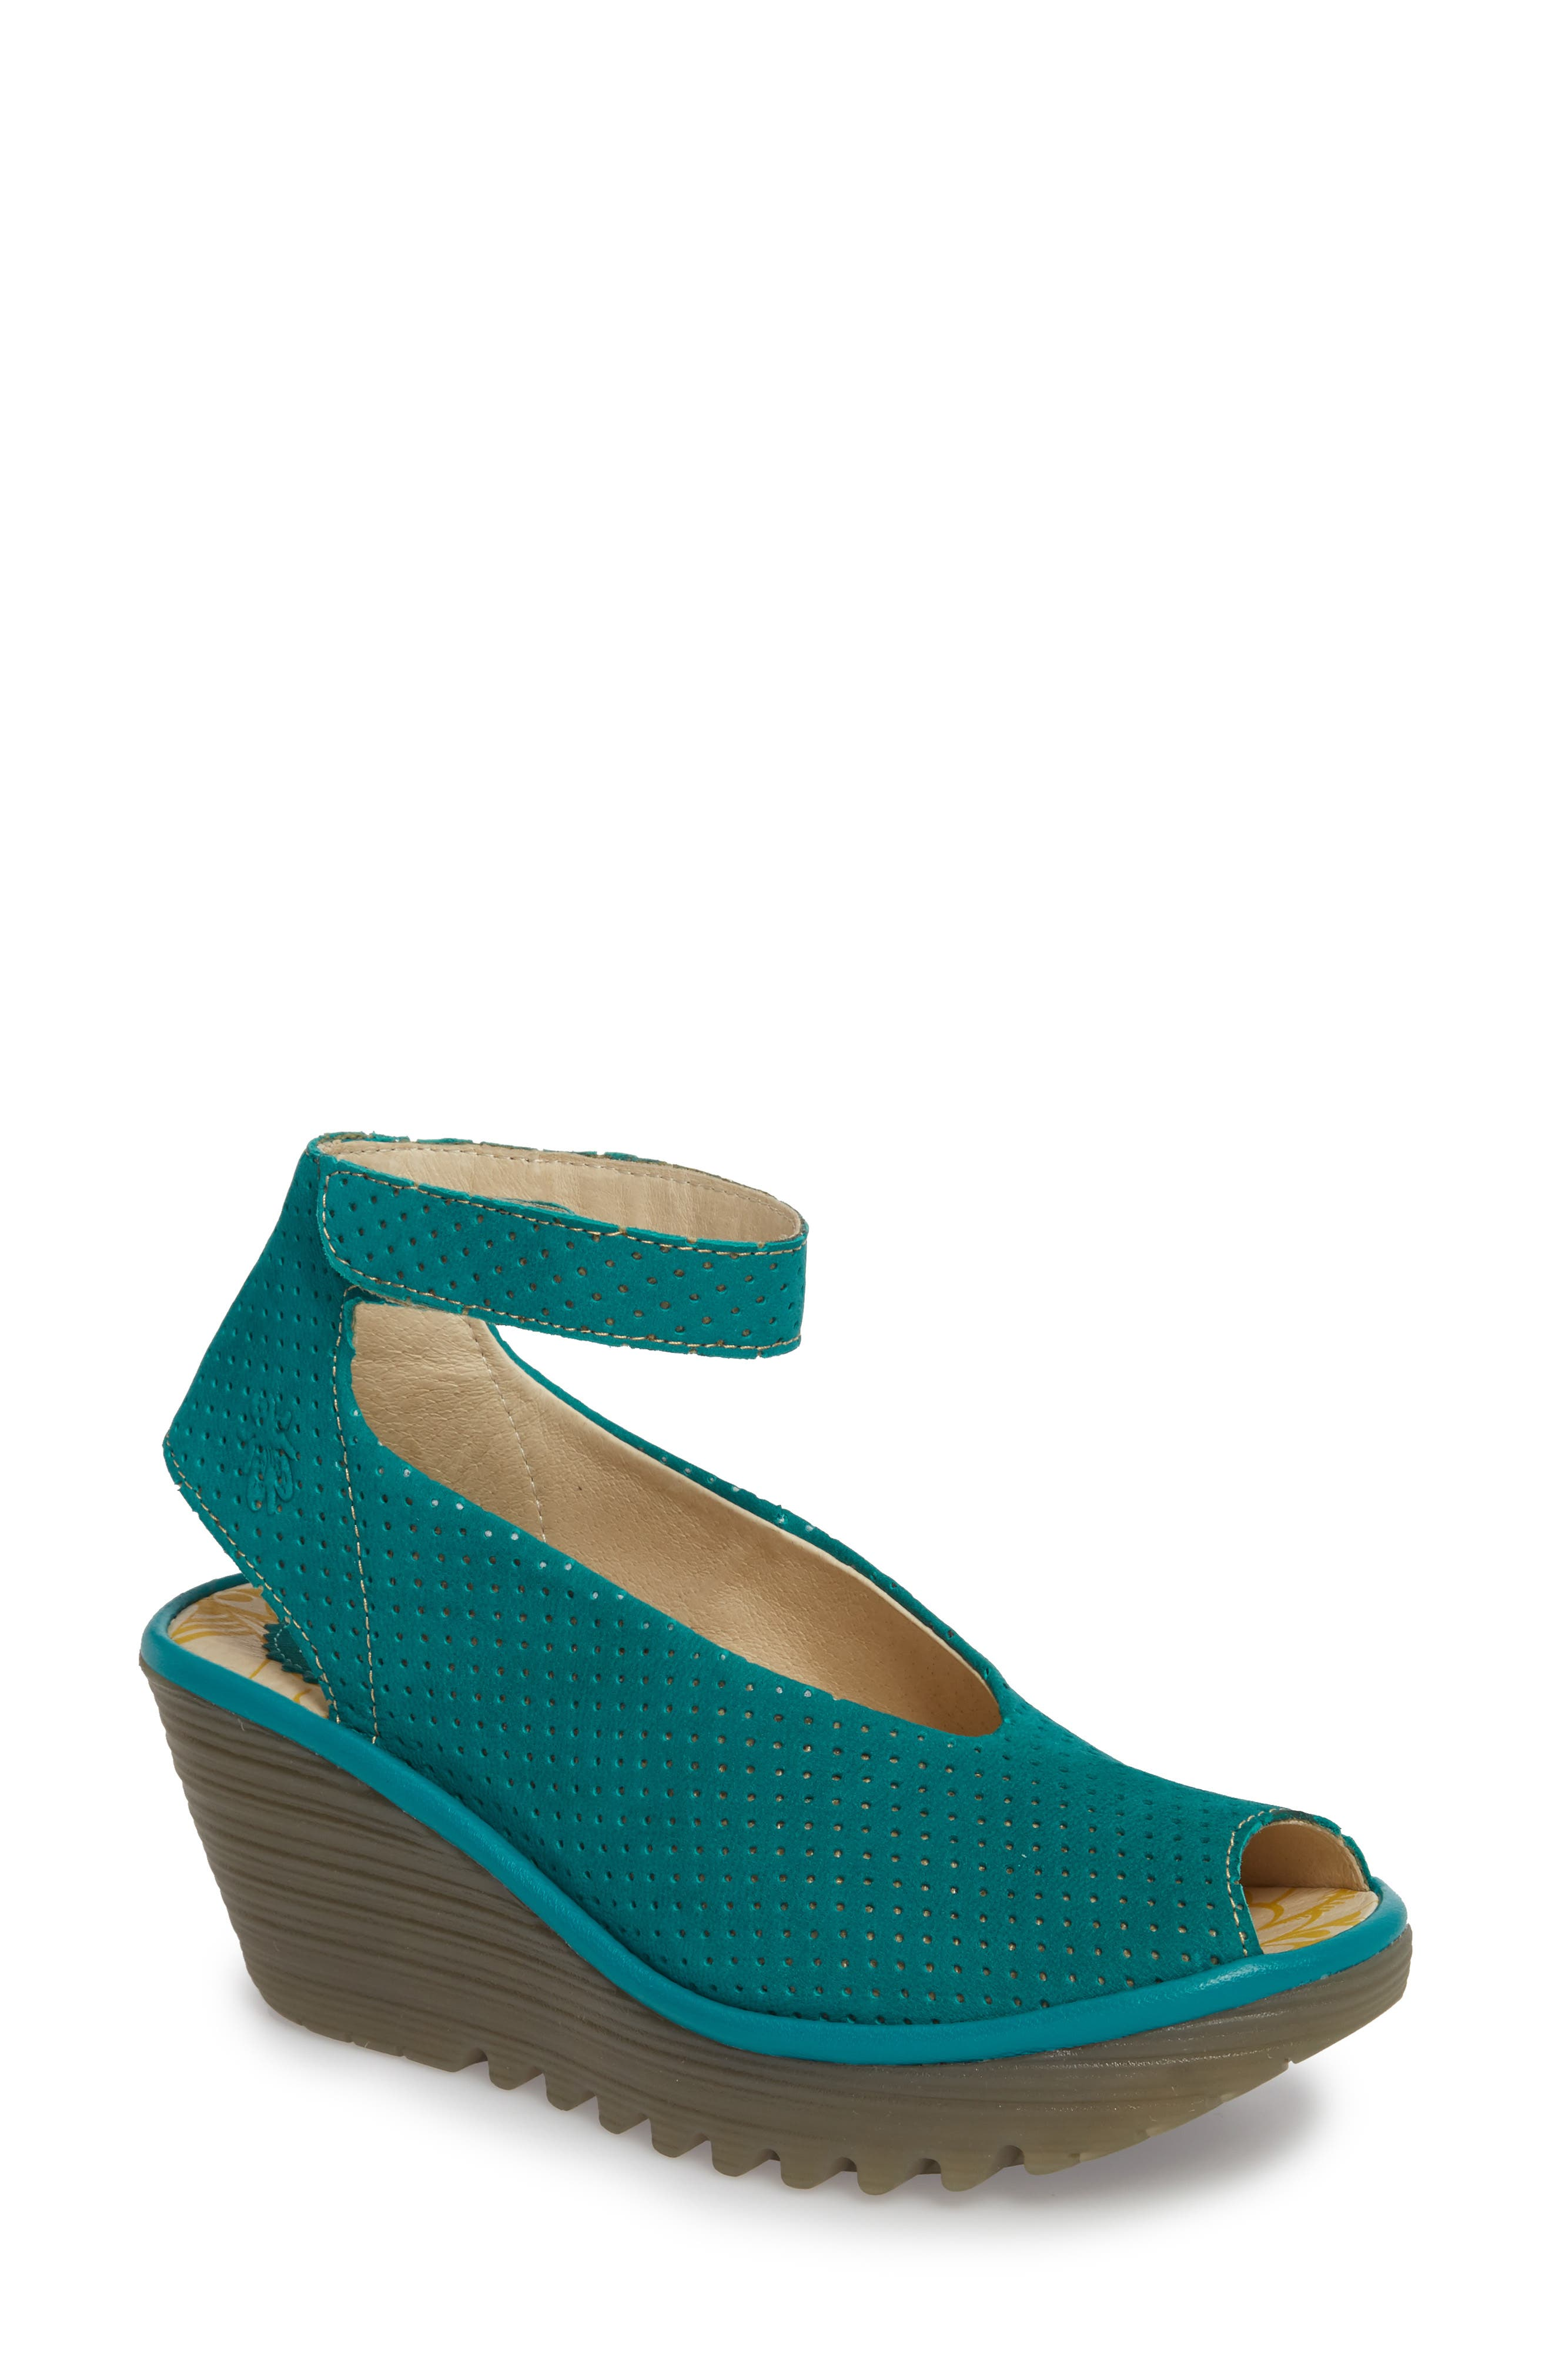 Alternate Image 1 Selected - Fly London 'Yala' Perforated Leather Sandal